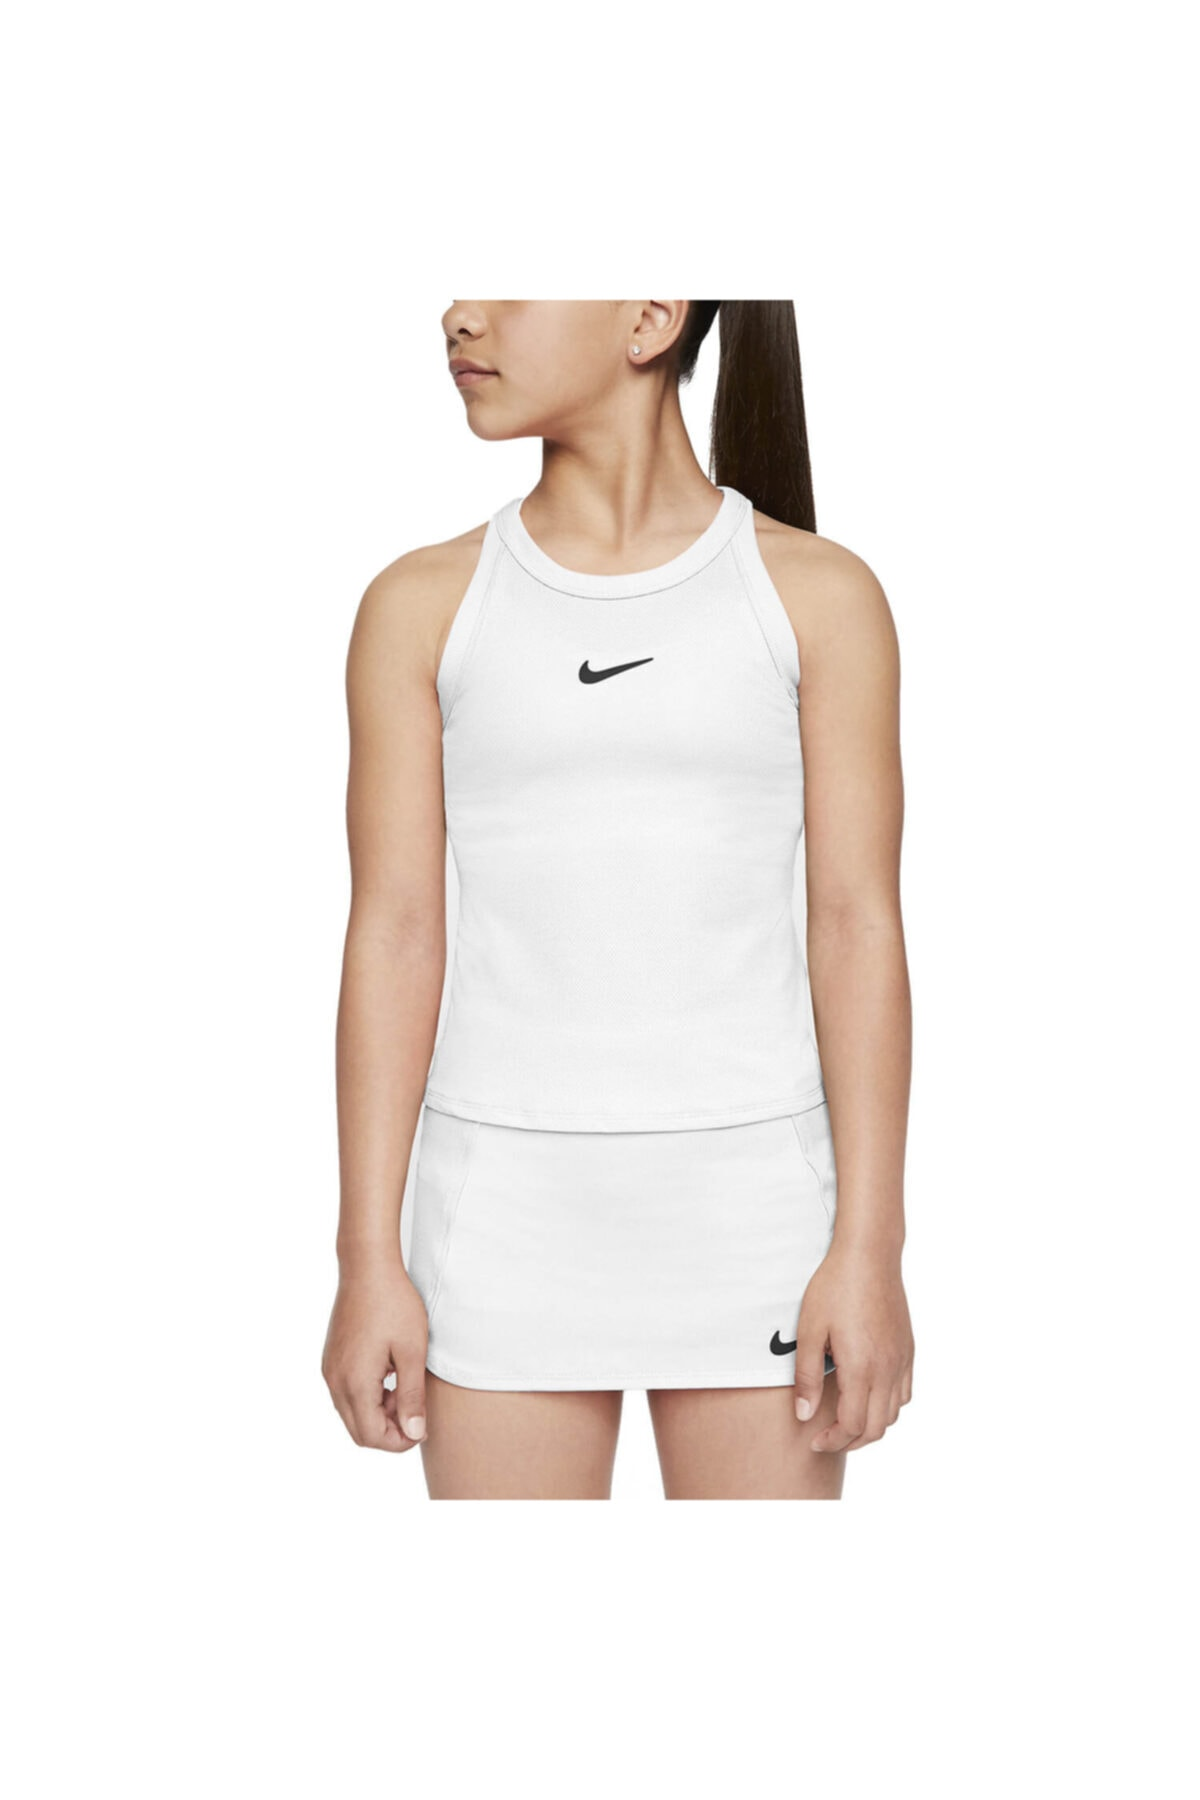 Nike Cj0946-100 G Nkct Dry Tank Çocuk Tenis Atlet 1